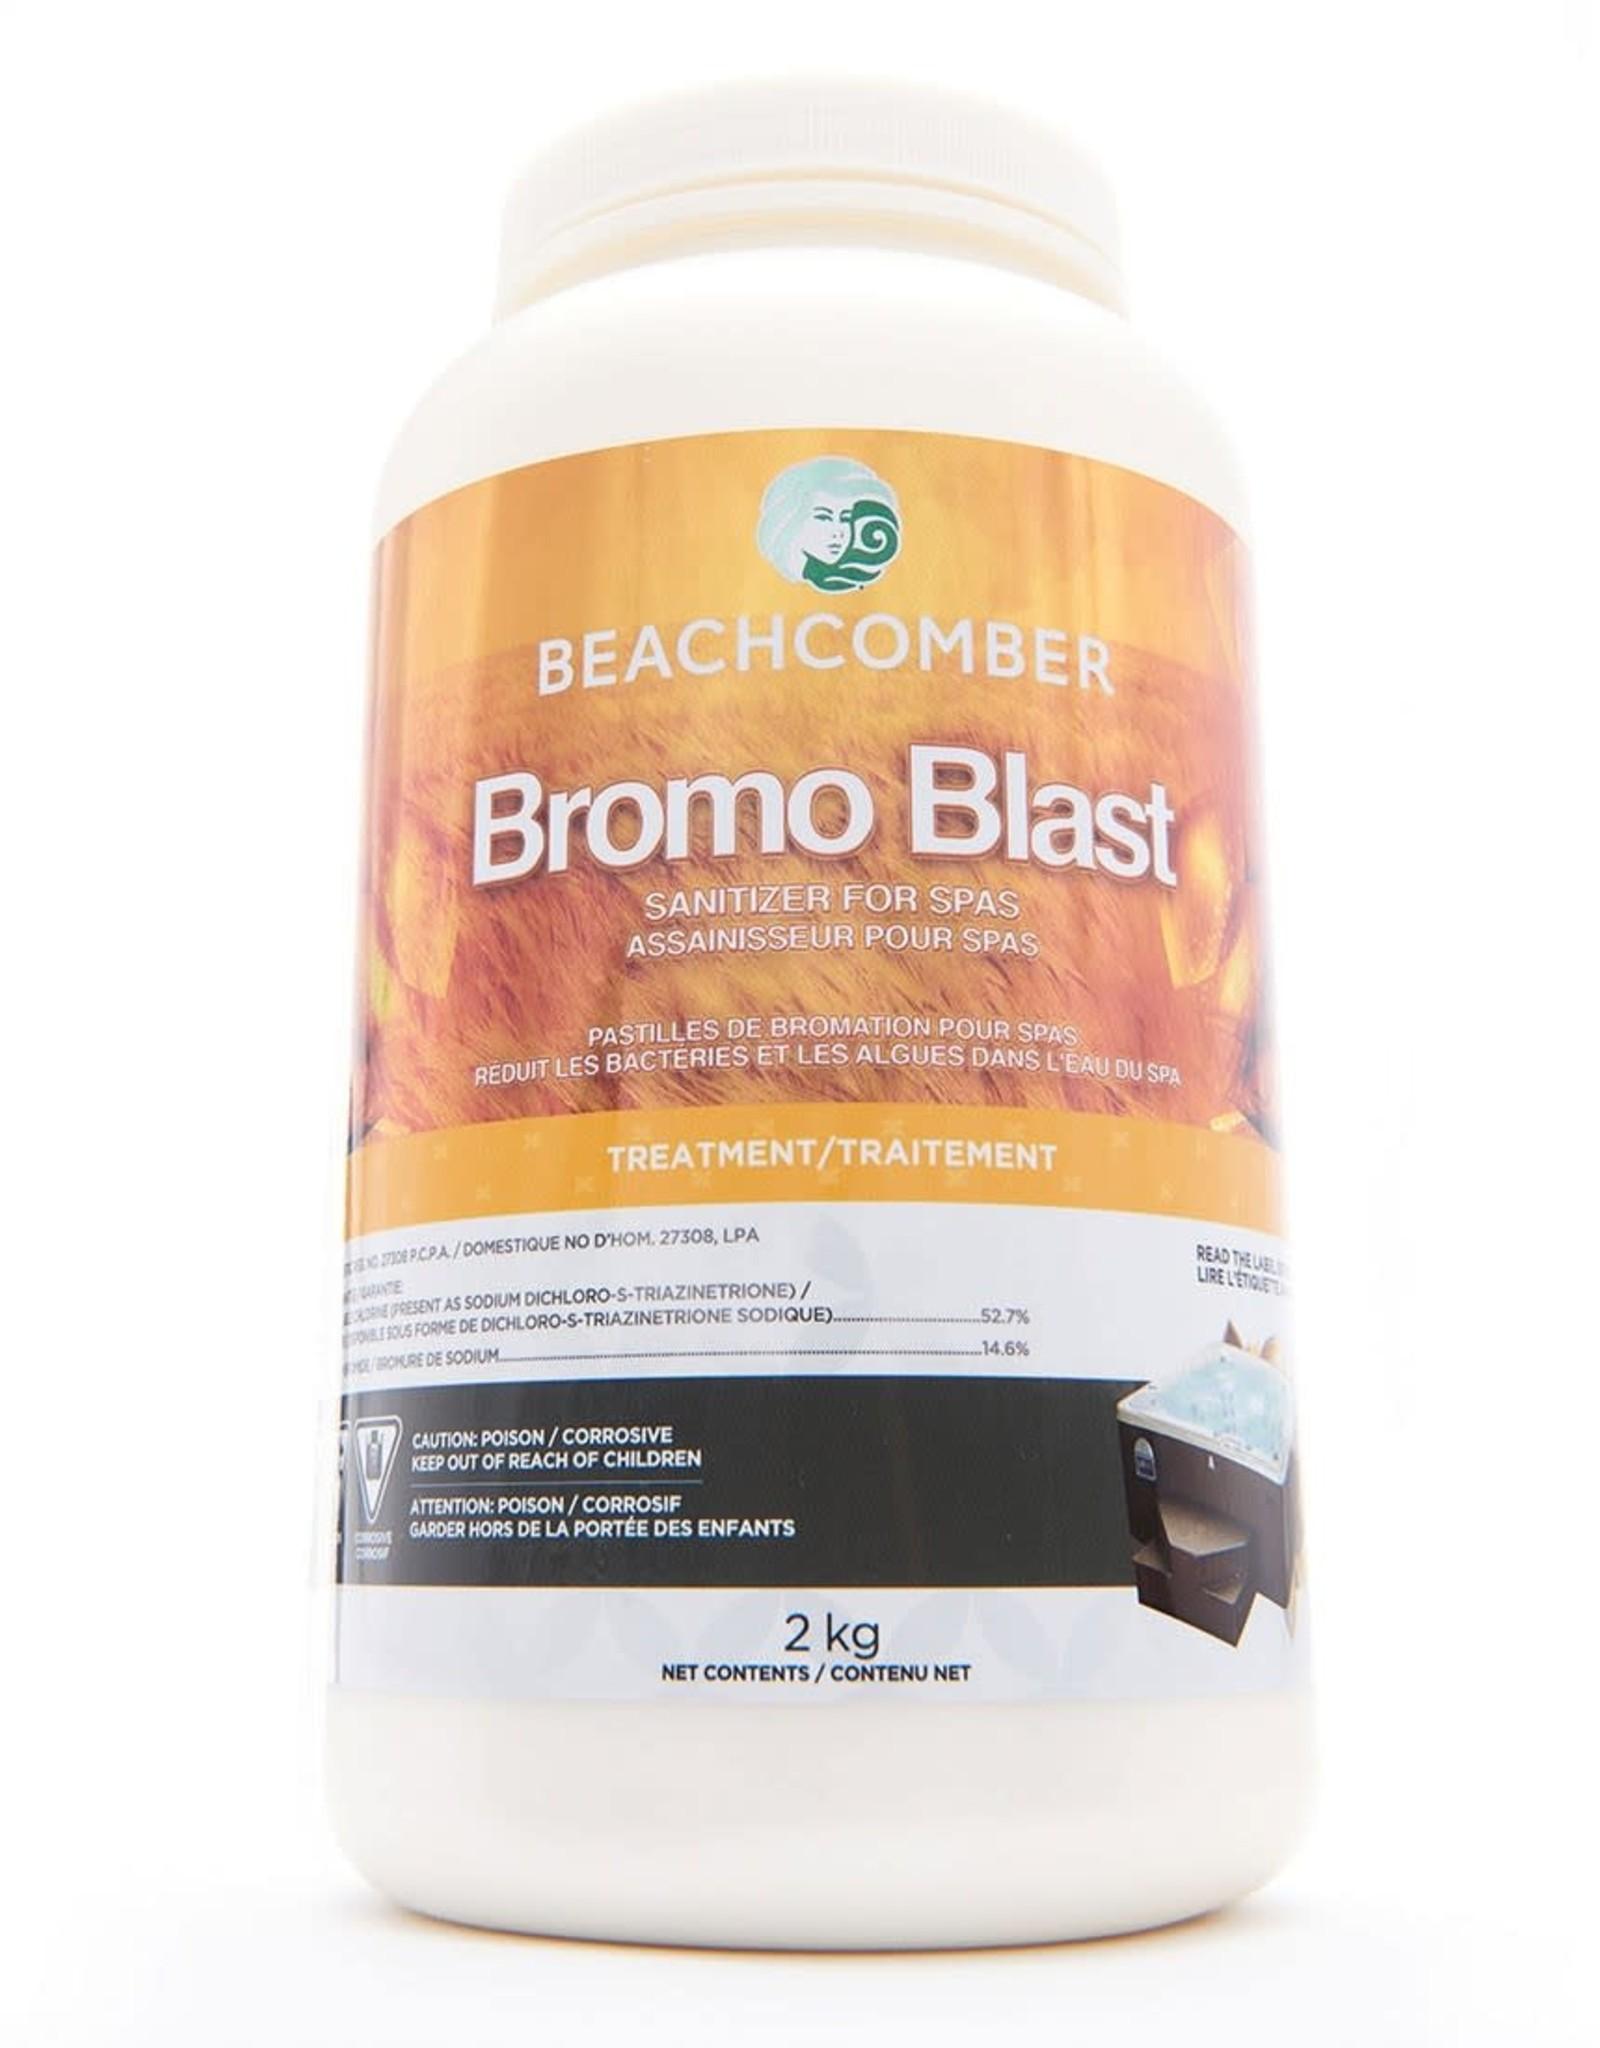 BEACHCOMBER BROMO BLAST - 2KG